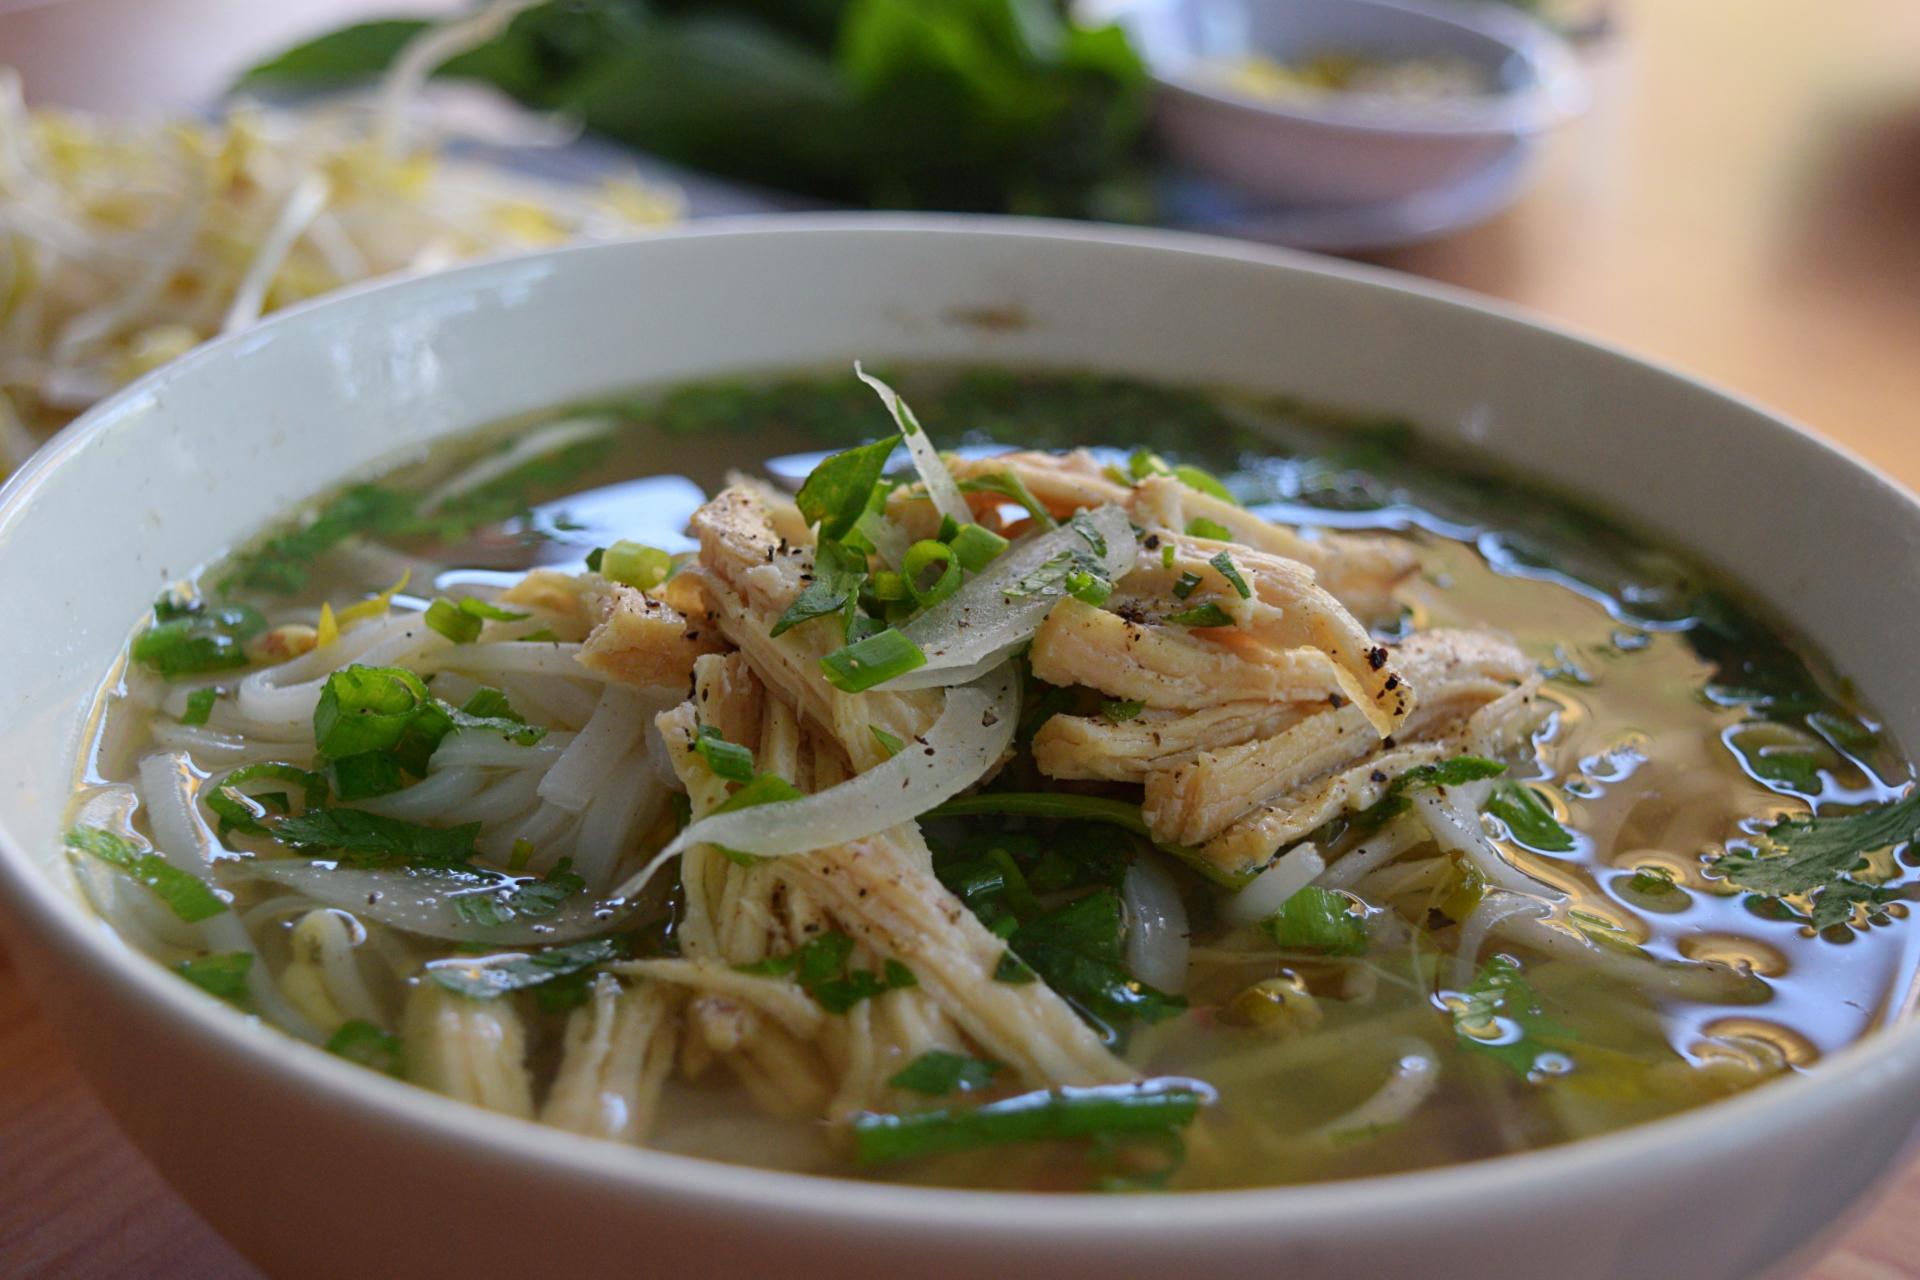 Top 10 Vietnamese Foods - GoMad Nomad